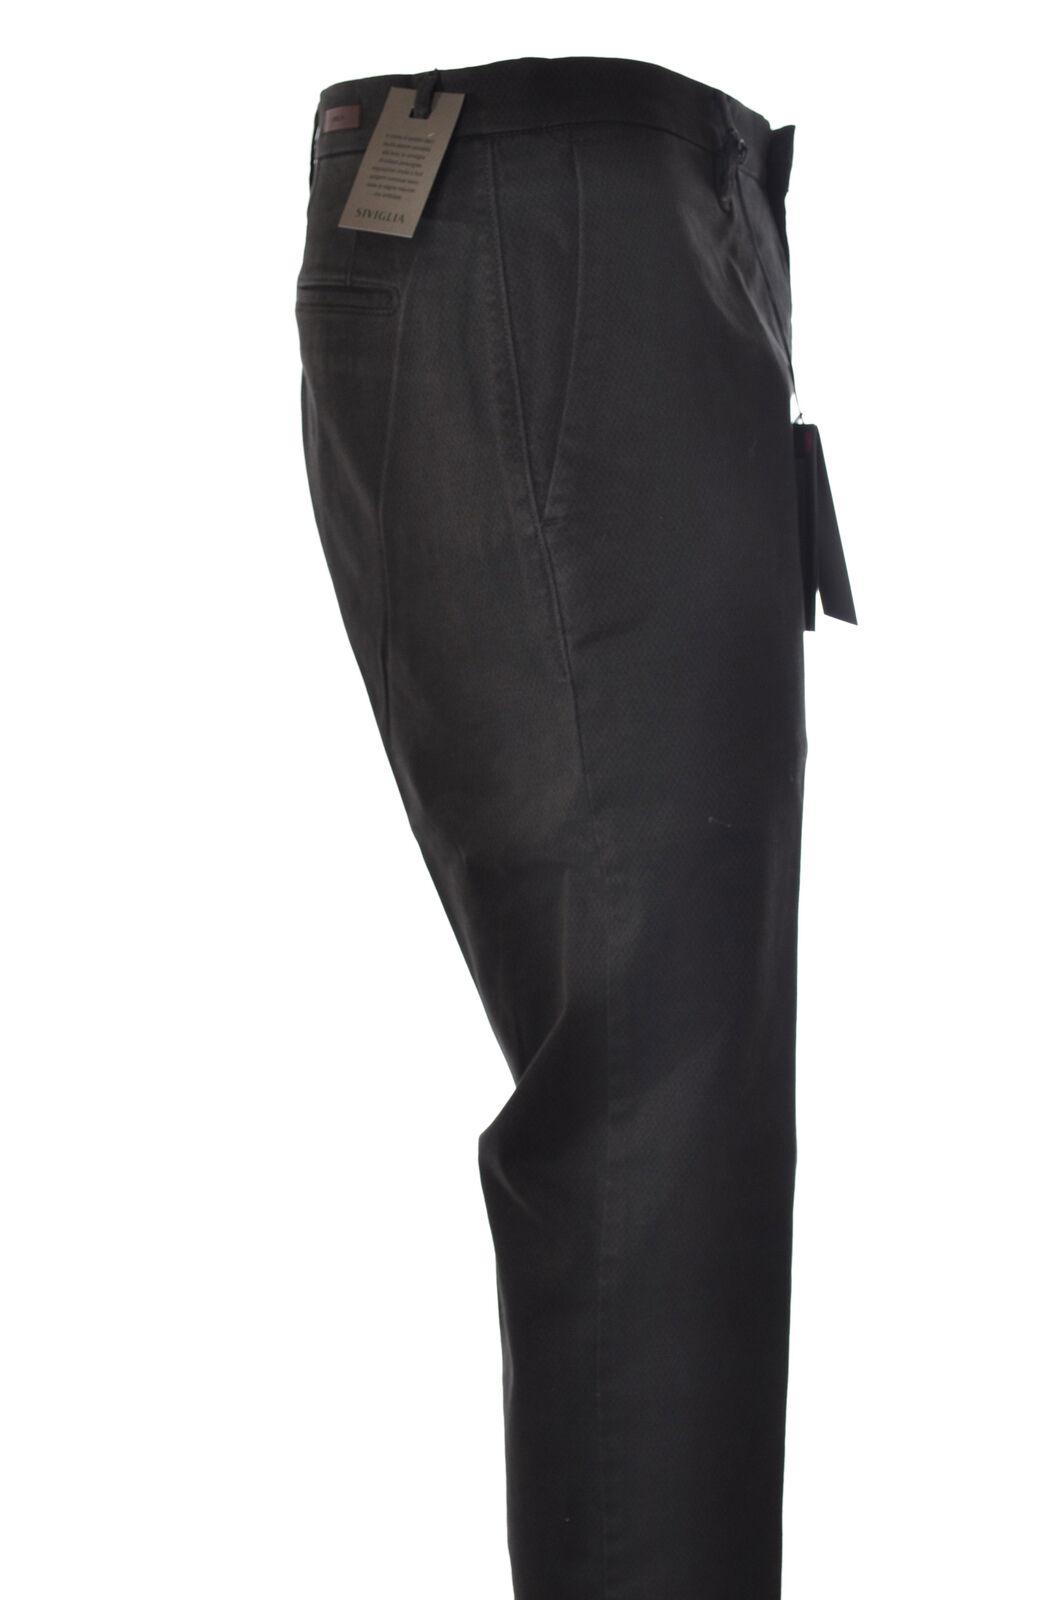 Siviglia - Pants-Pants - Man - Green - 2682706C192802